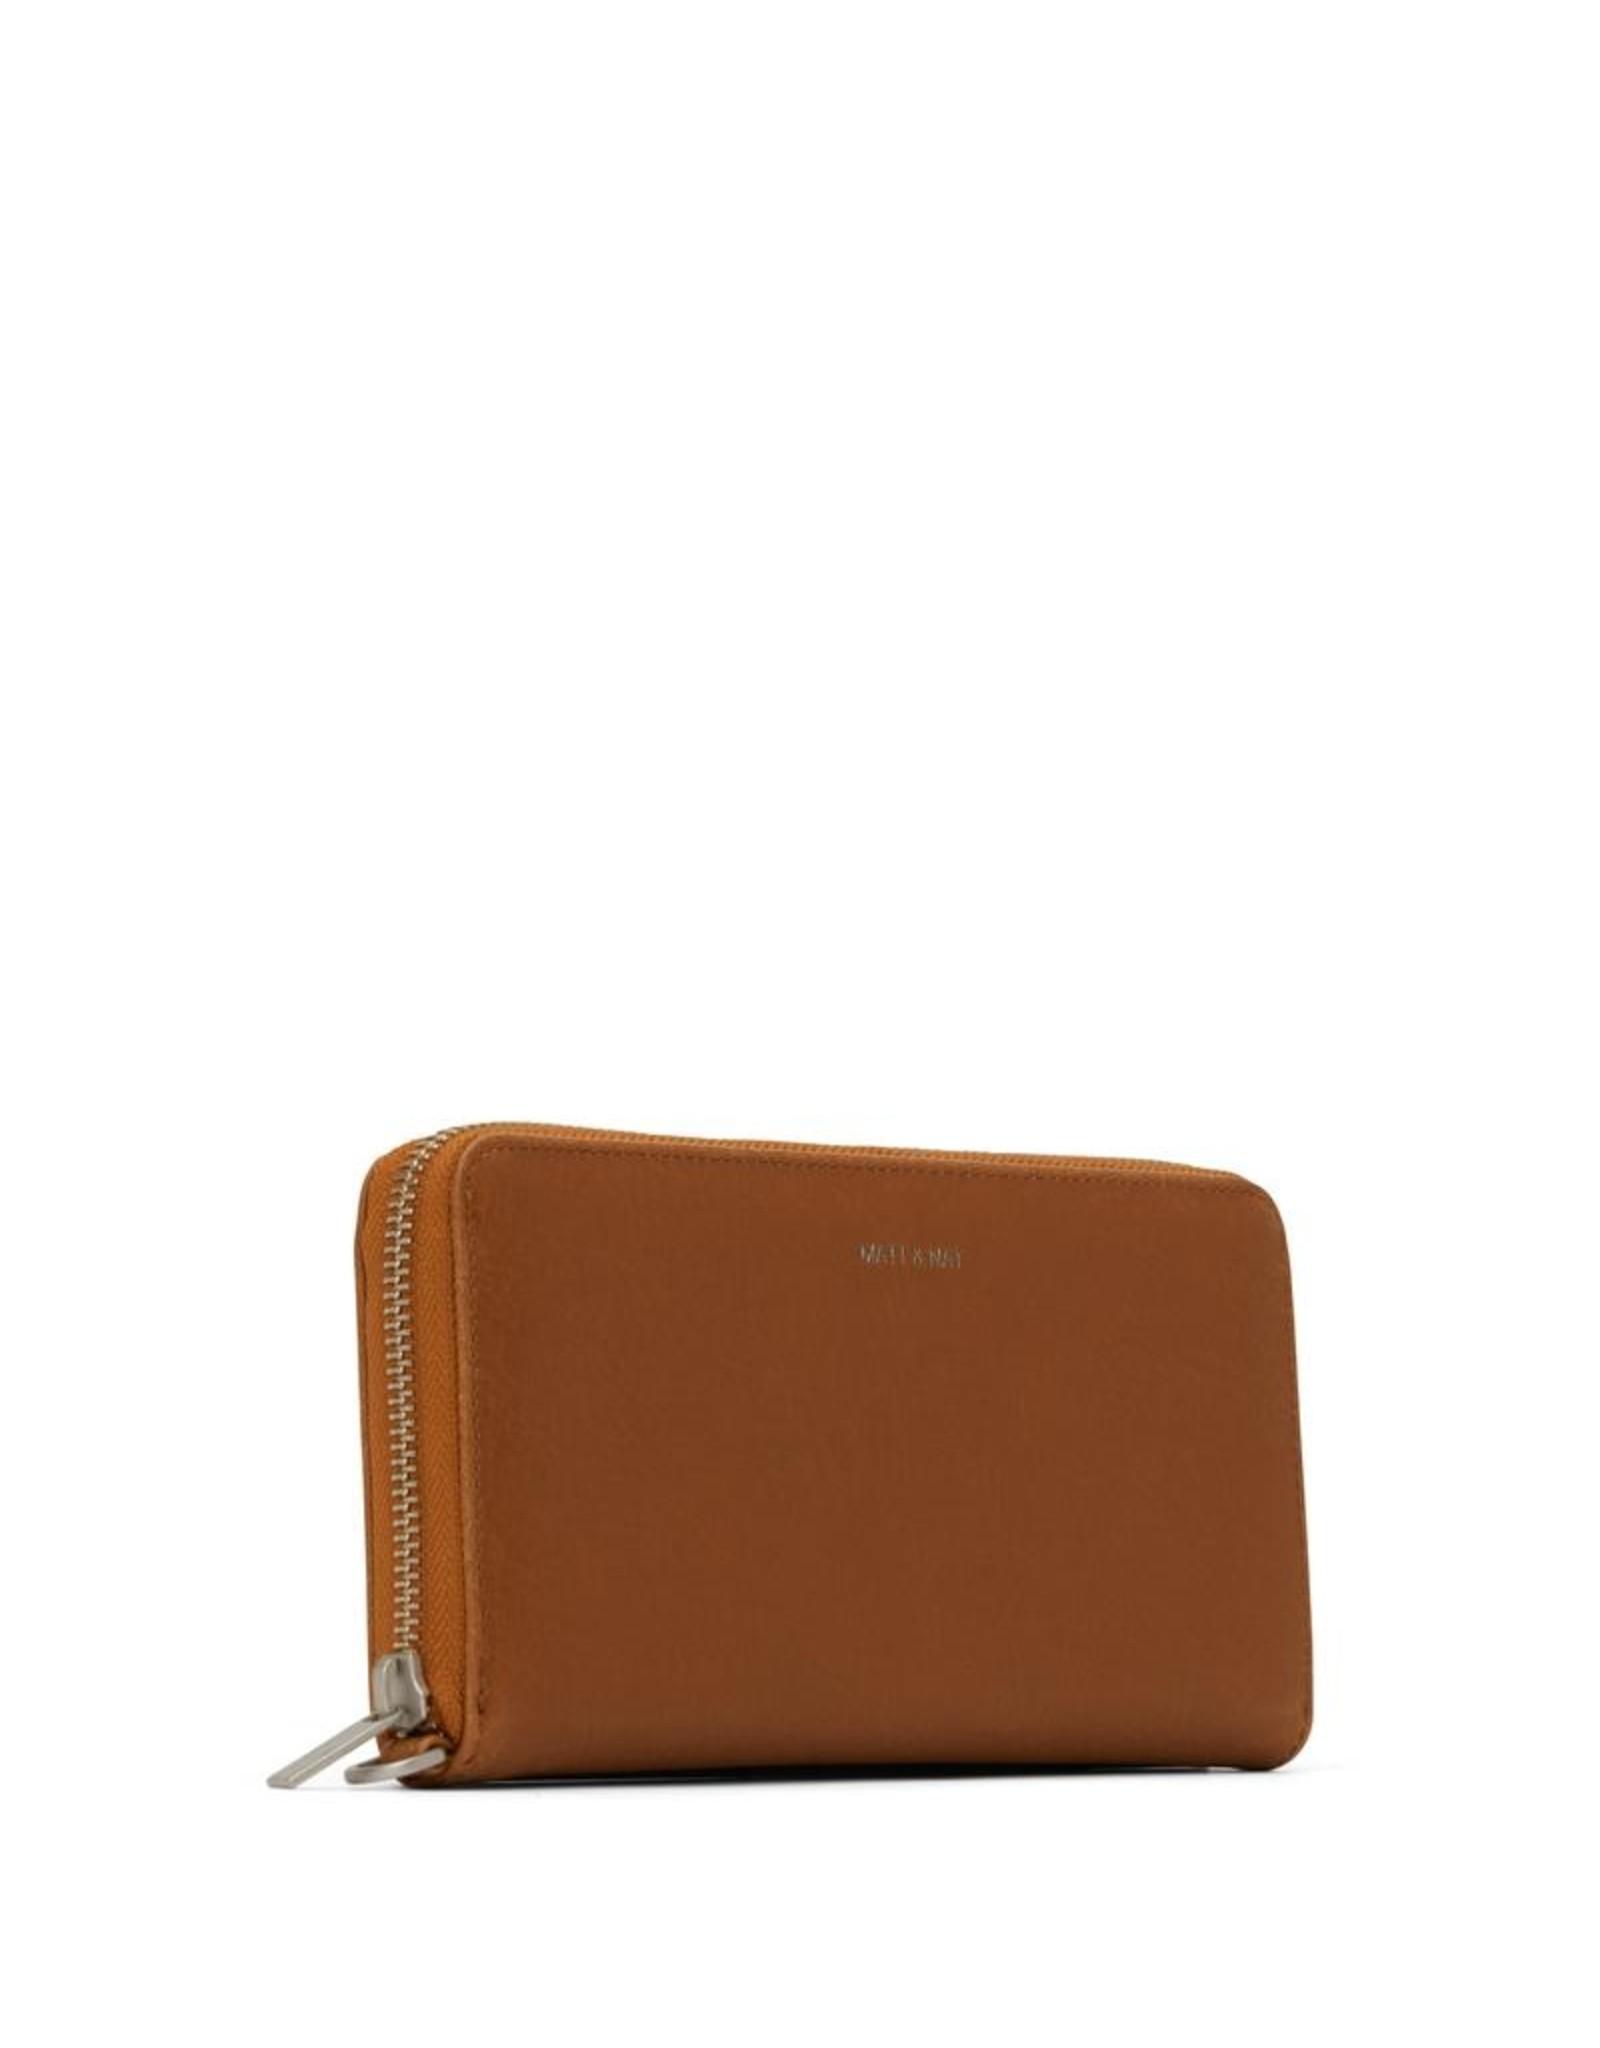 Matt & Nat - Wallet With Wrist Strap Elm/Chili